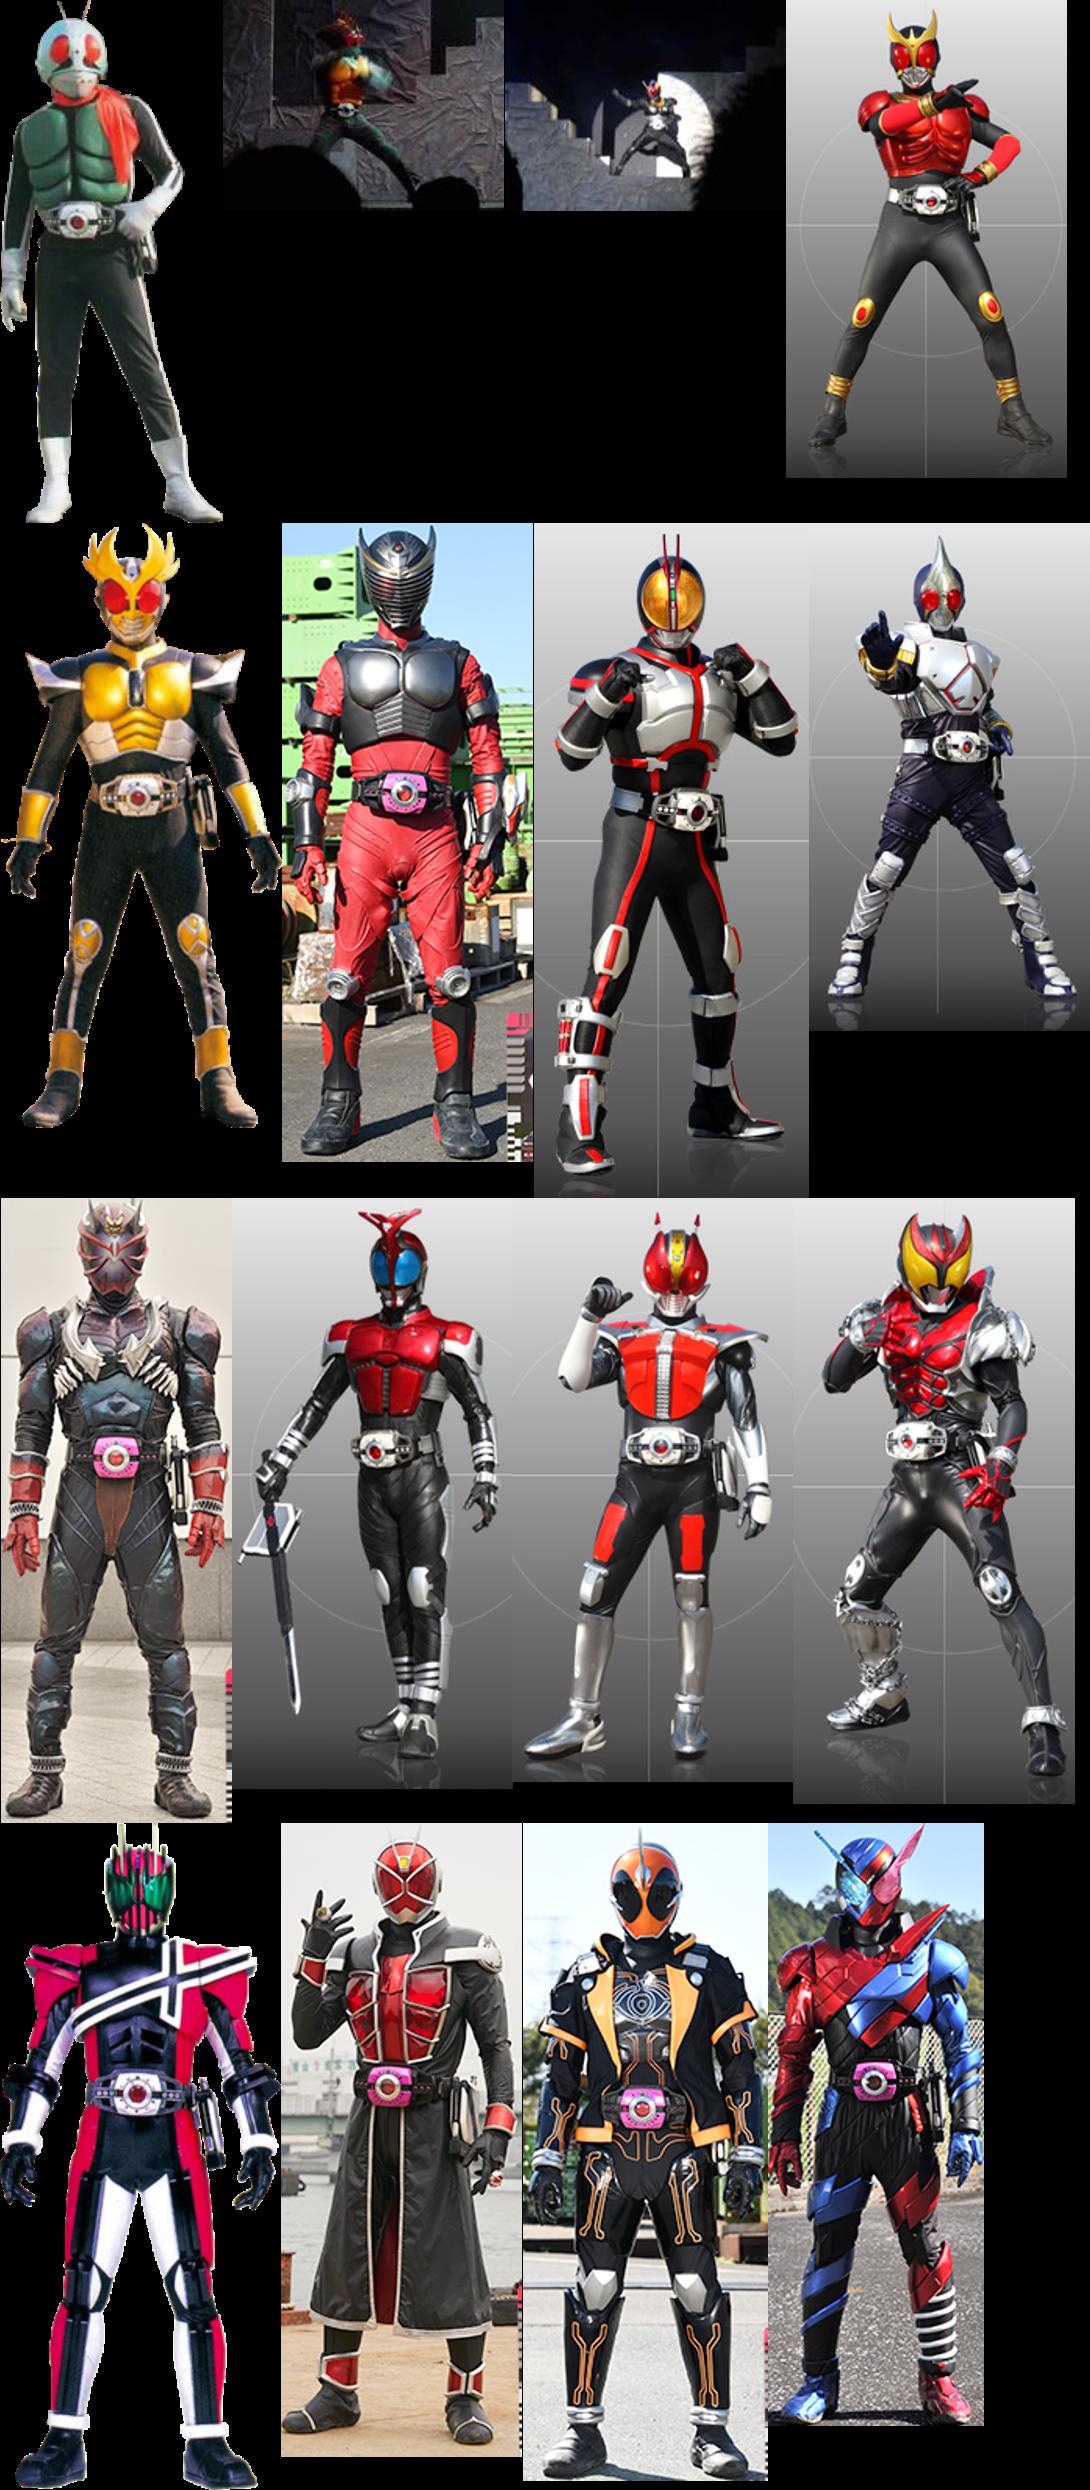 Pin On Kamen Rider Decade Violent Emotion